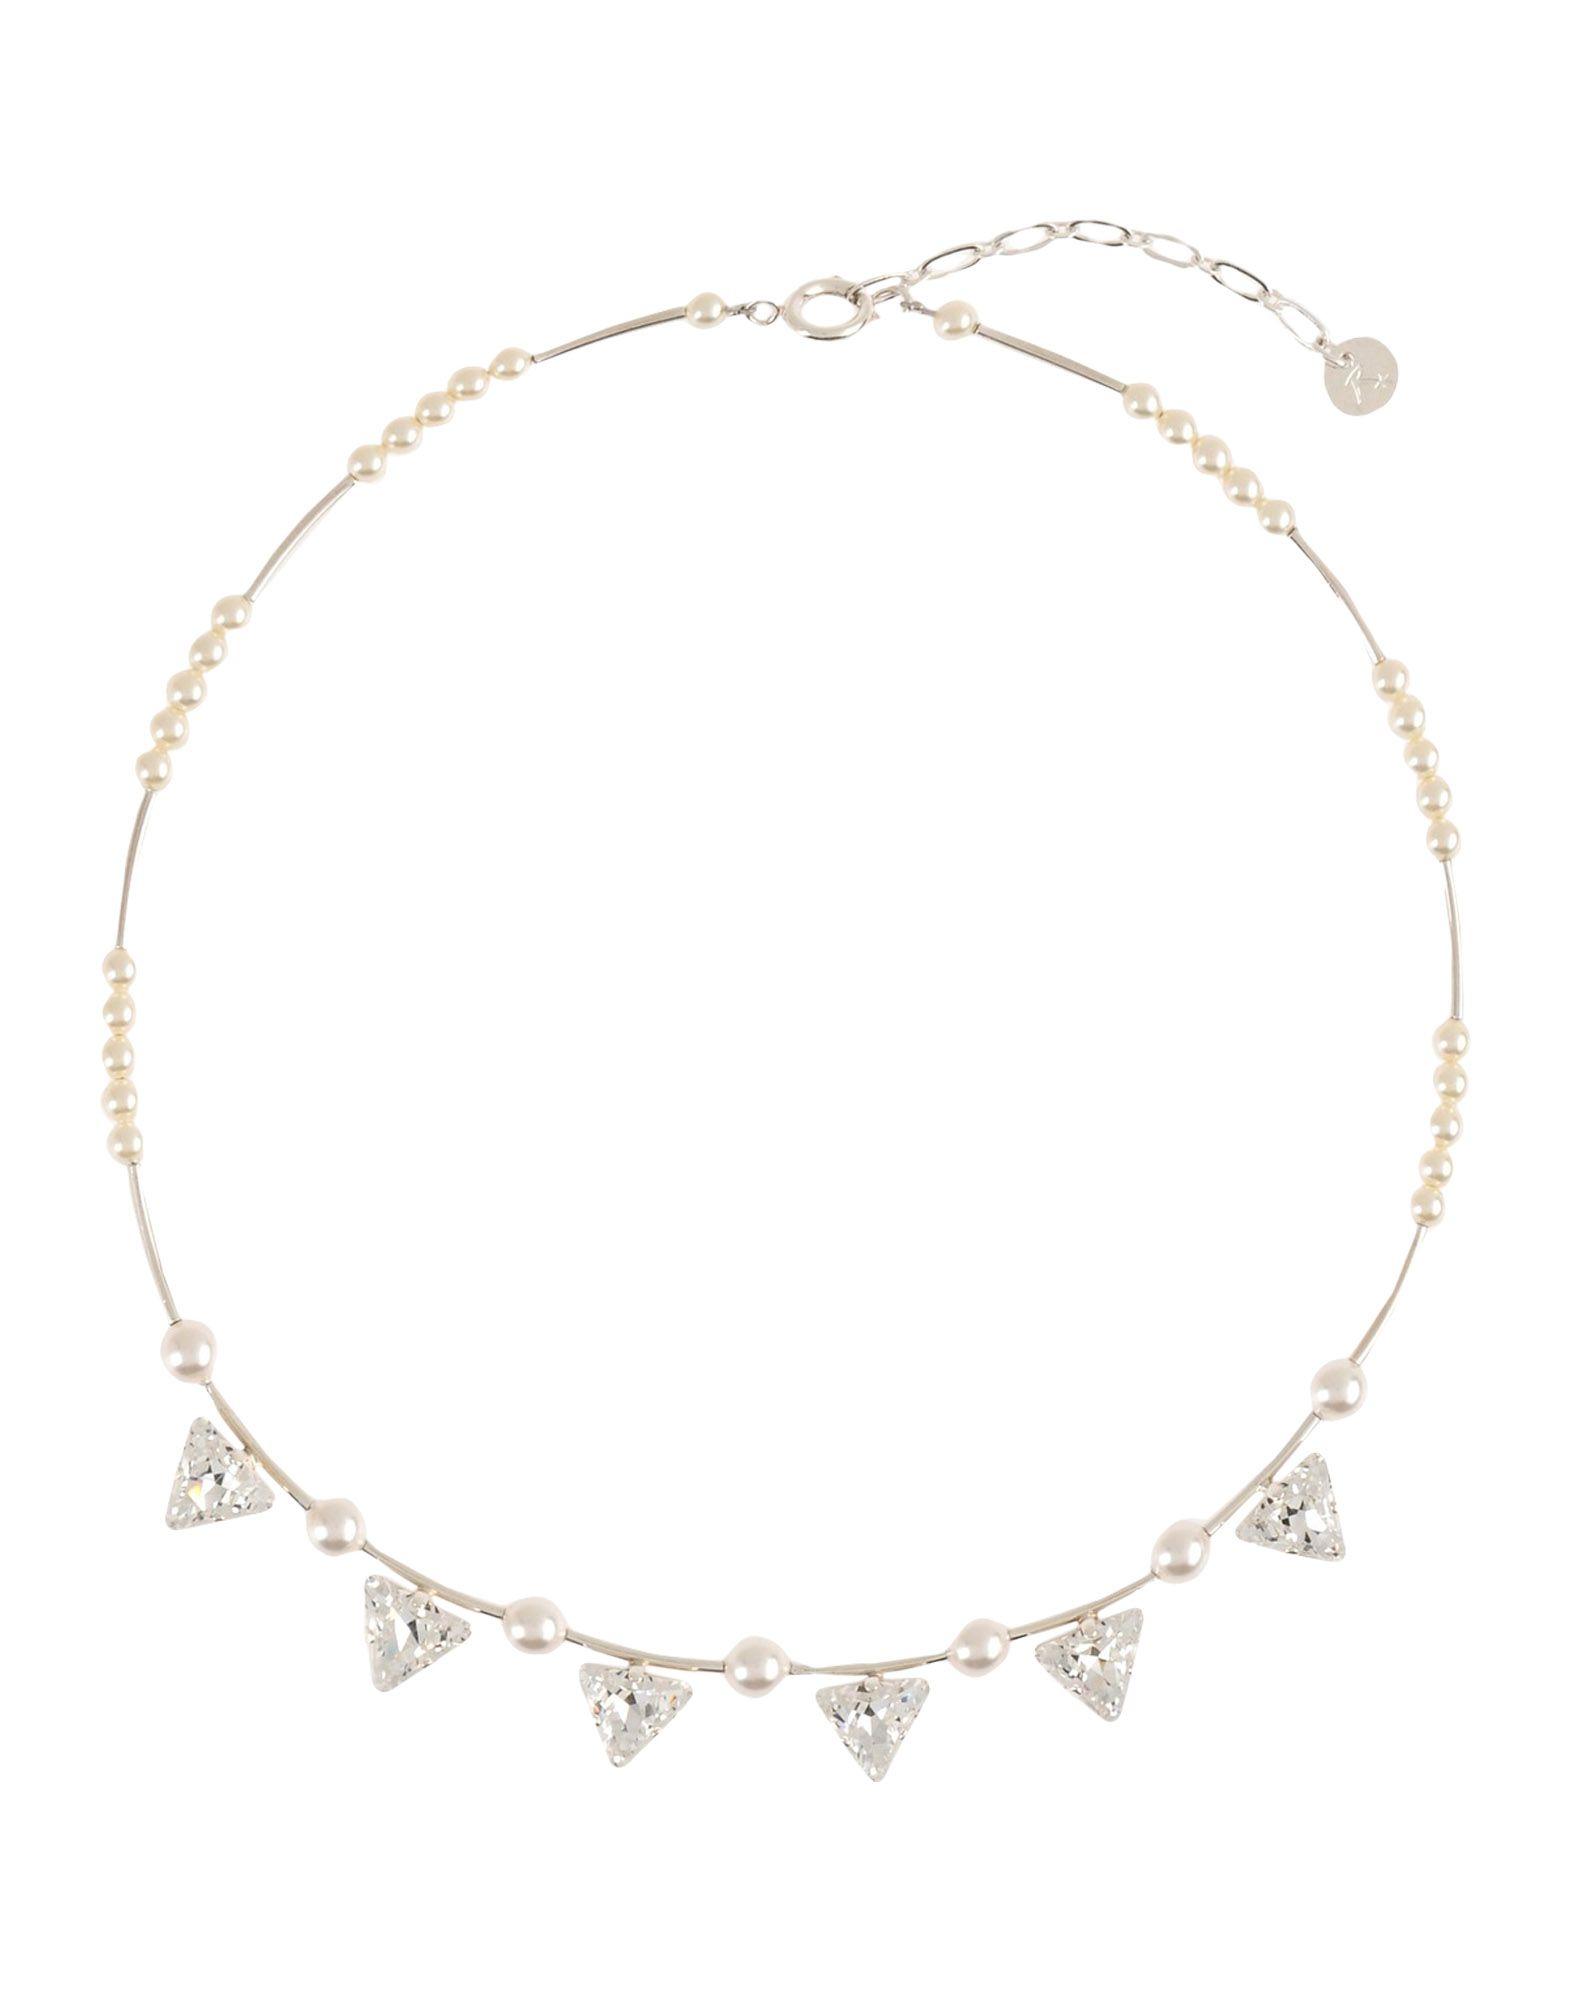 Agnona JEWELRY - Necklaces su YOOX.COM 1WwRYp